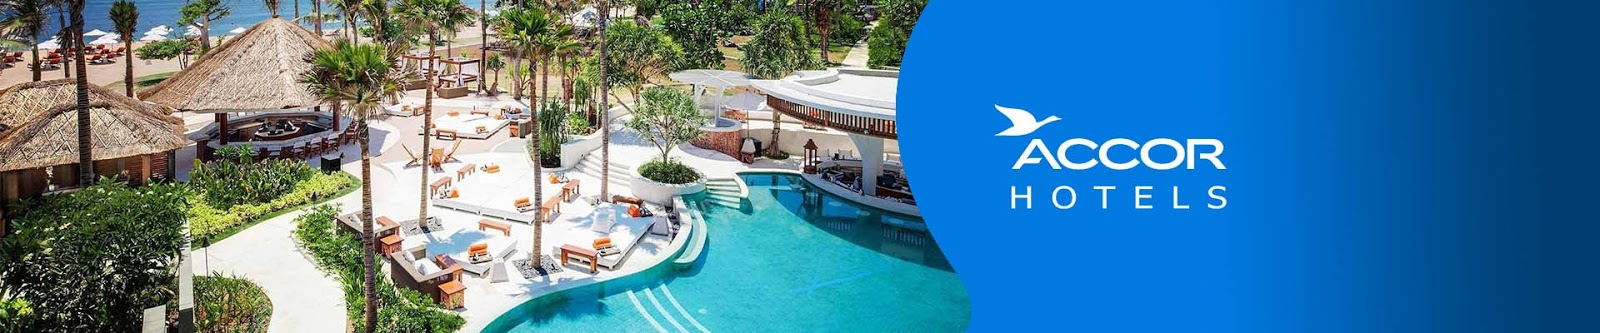 Mister Aladin, Sarana untuk Booking Accor Hotel Group Secara Mudah, Cepat dan Aman